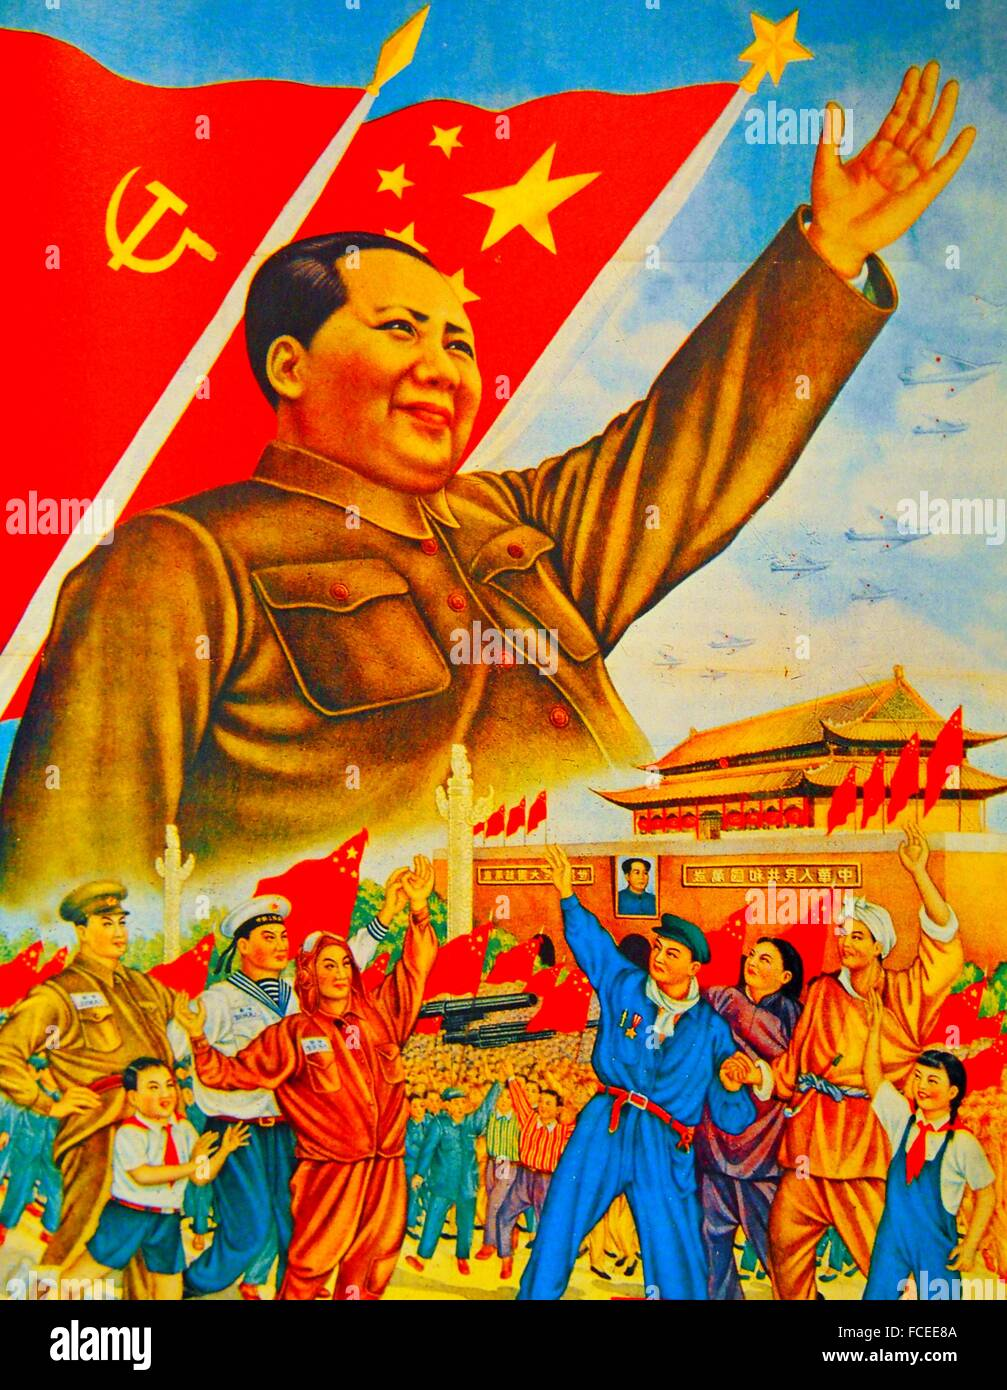 China- Propaganda poster, 1949 : 'All unite behind Mao'. - Stock Image